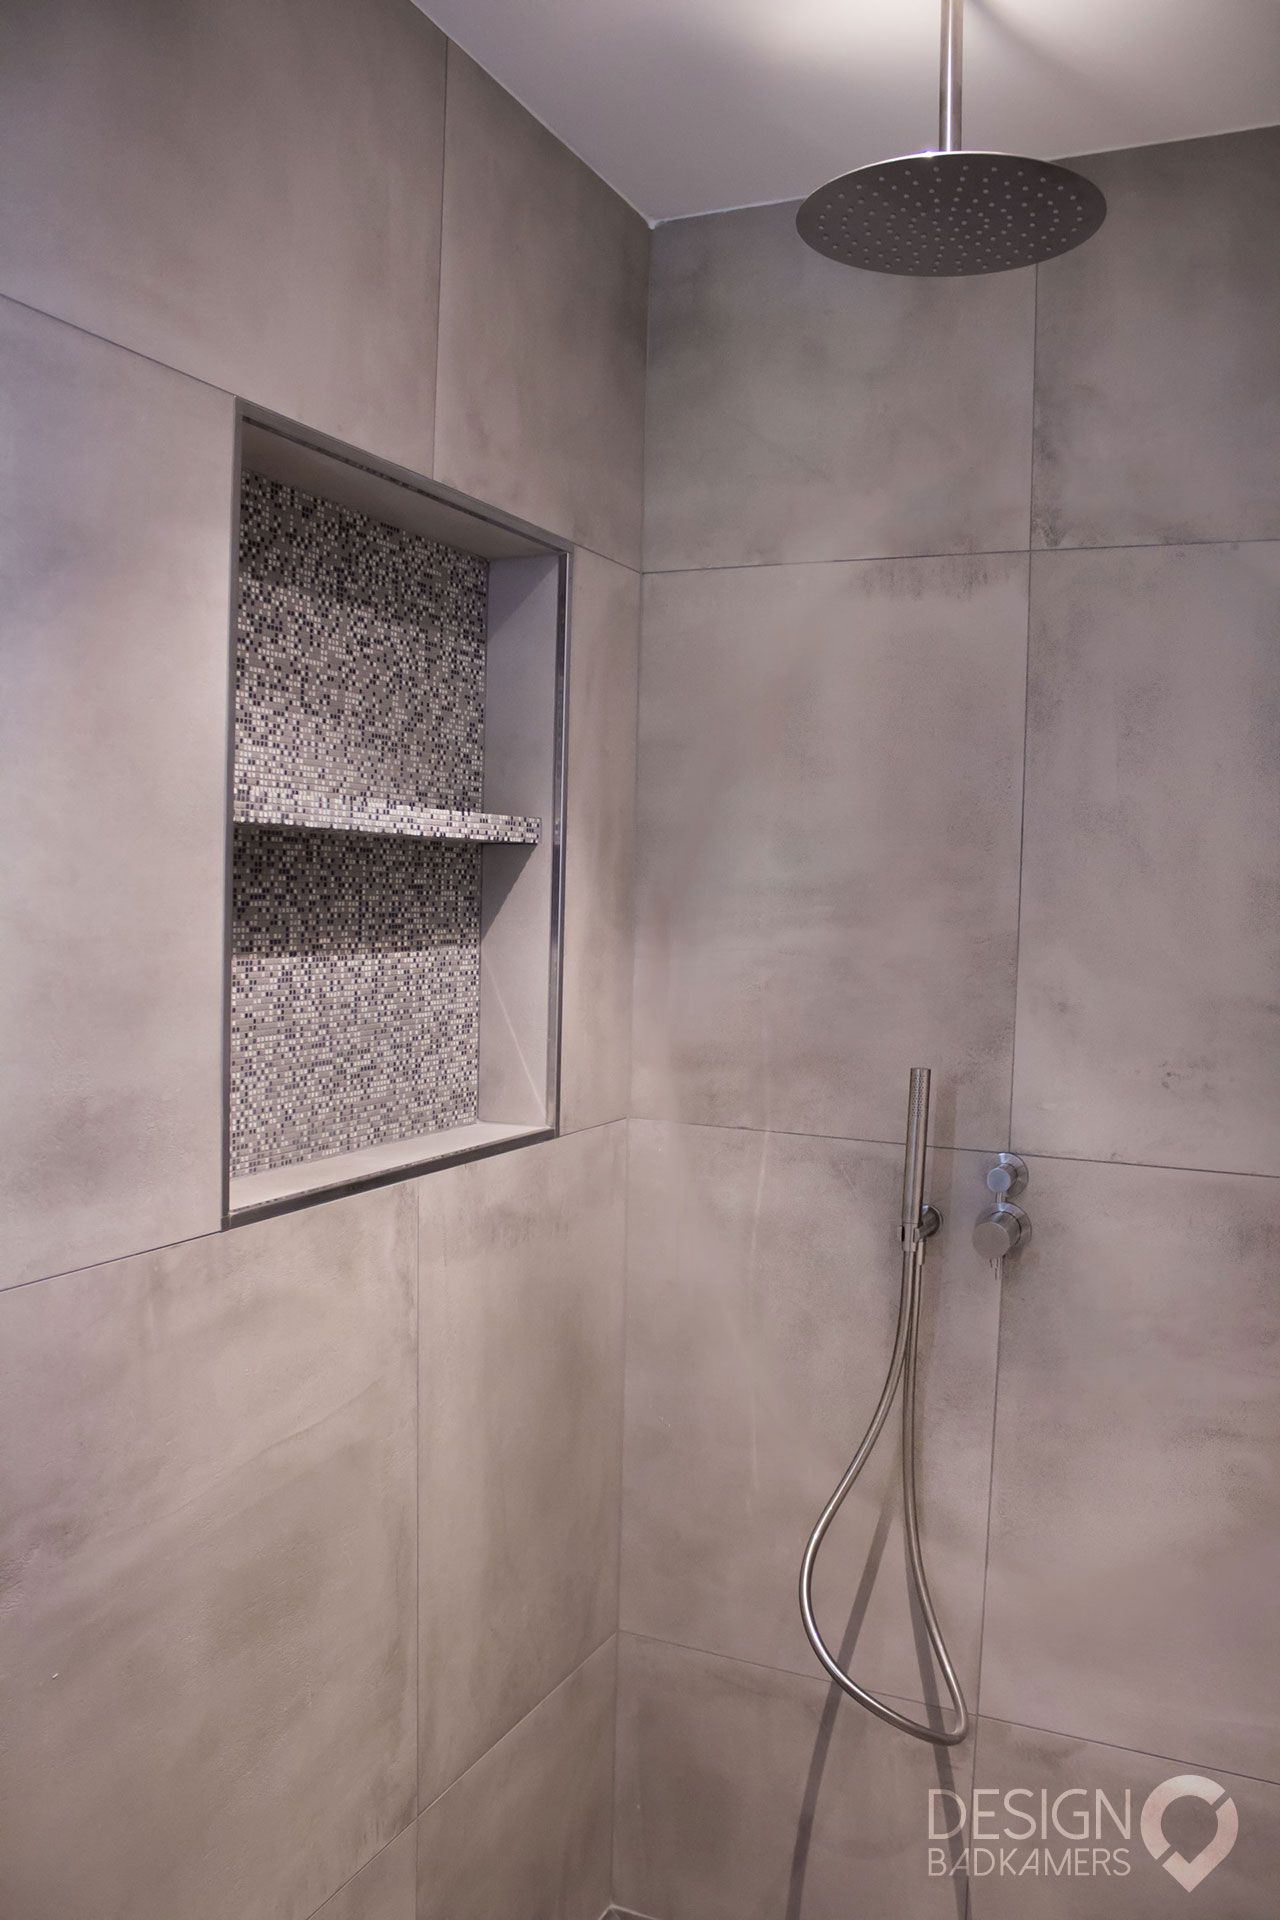 bk1 6 5 weblogo badkamer pinterest badkamer